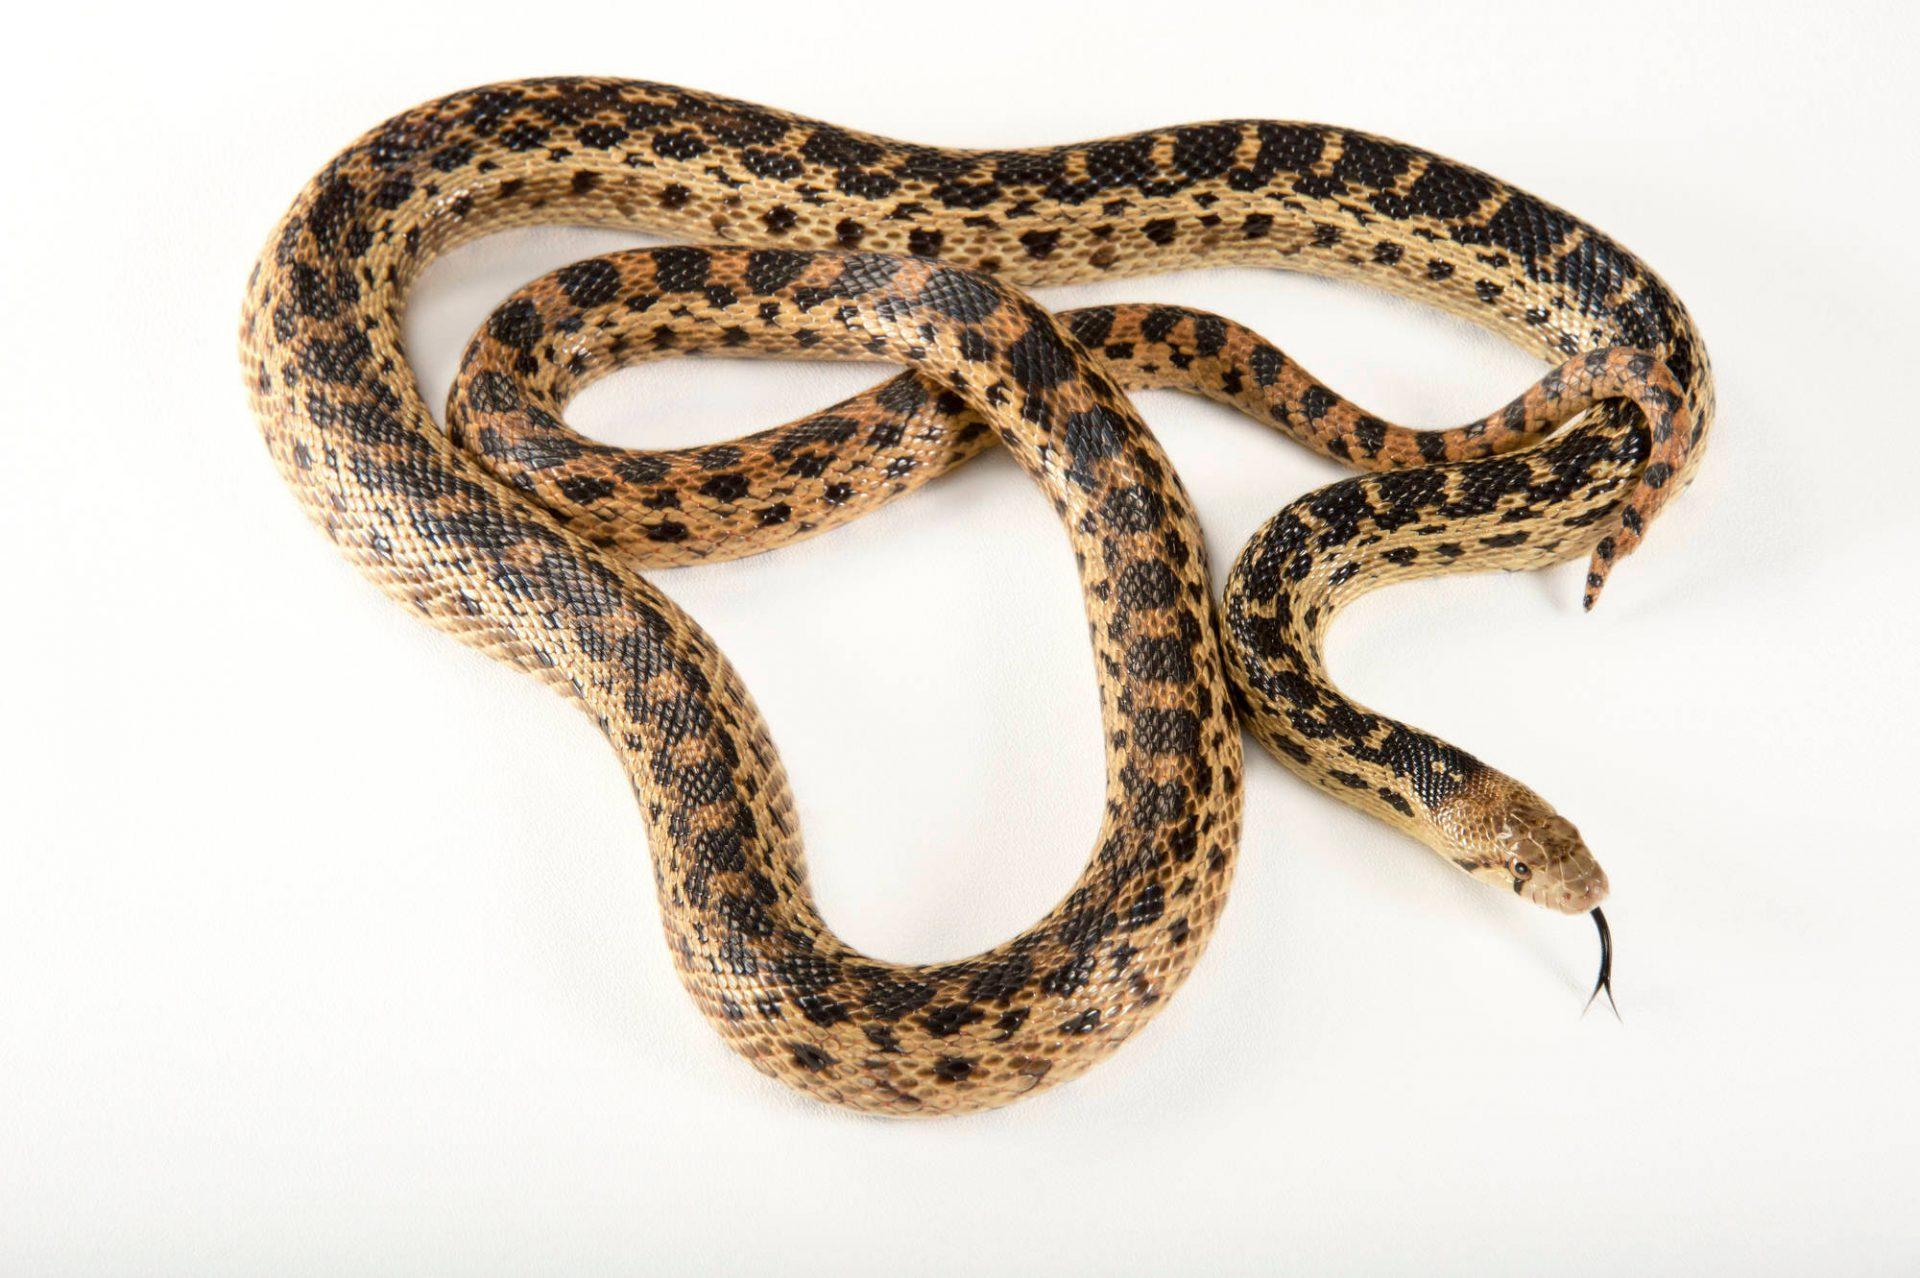 Picture of a Santa Cruz gopher snake (Pituophis catenifer pumilis) at the Santa Barbara Zoo.